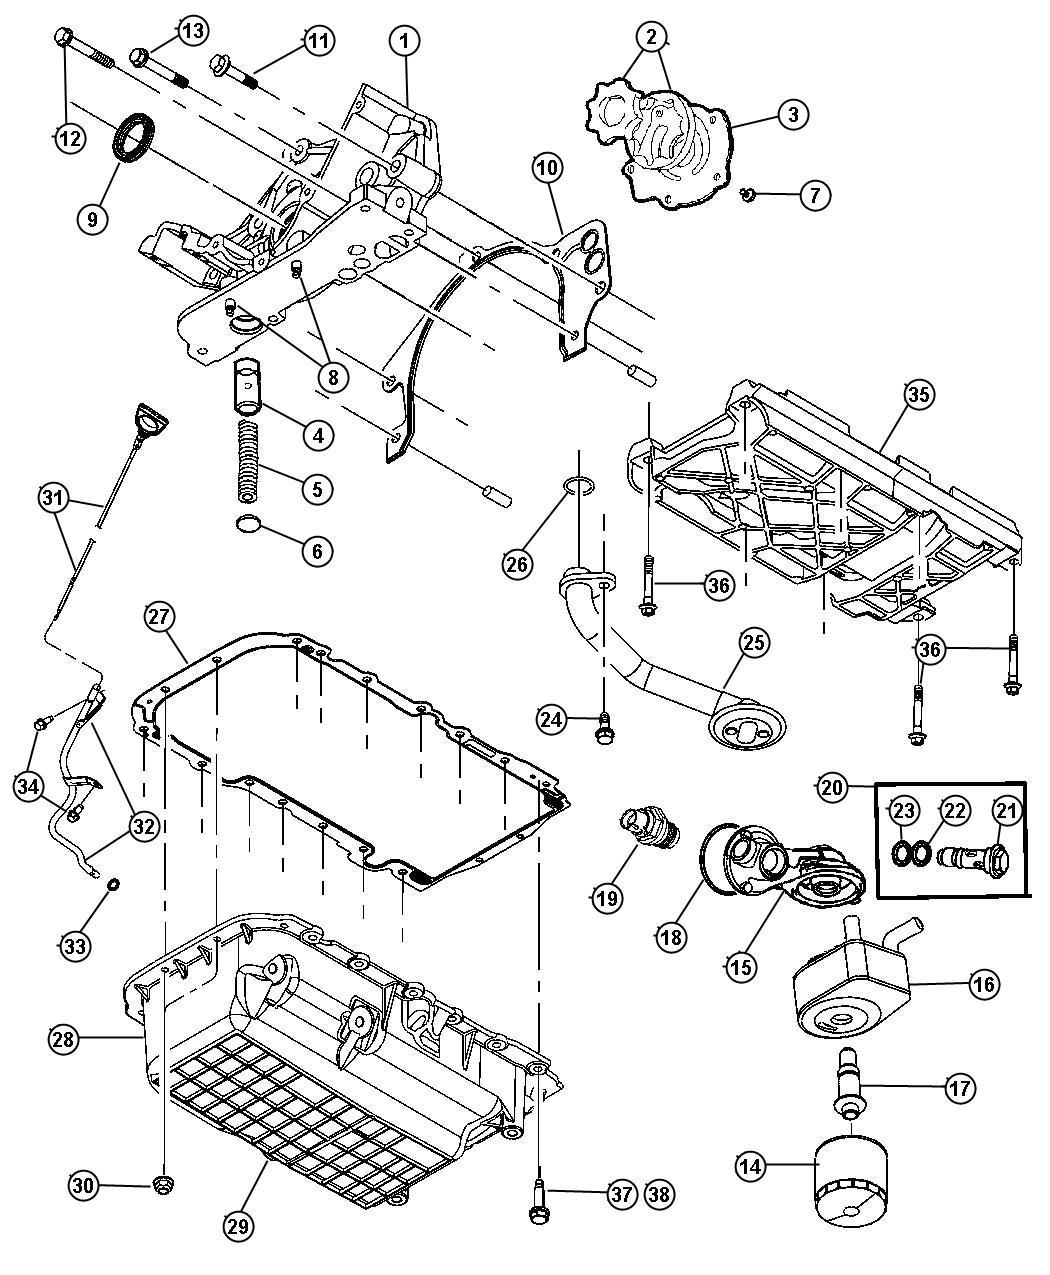 [DIAGRAM] 2 5l Chrysler Engine Diagrams FULL Version HD